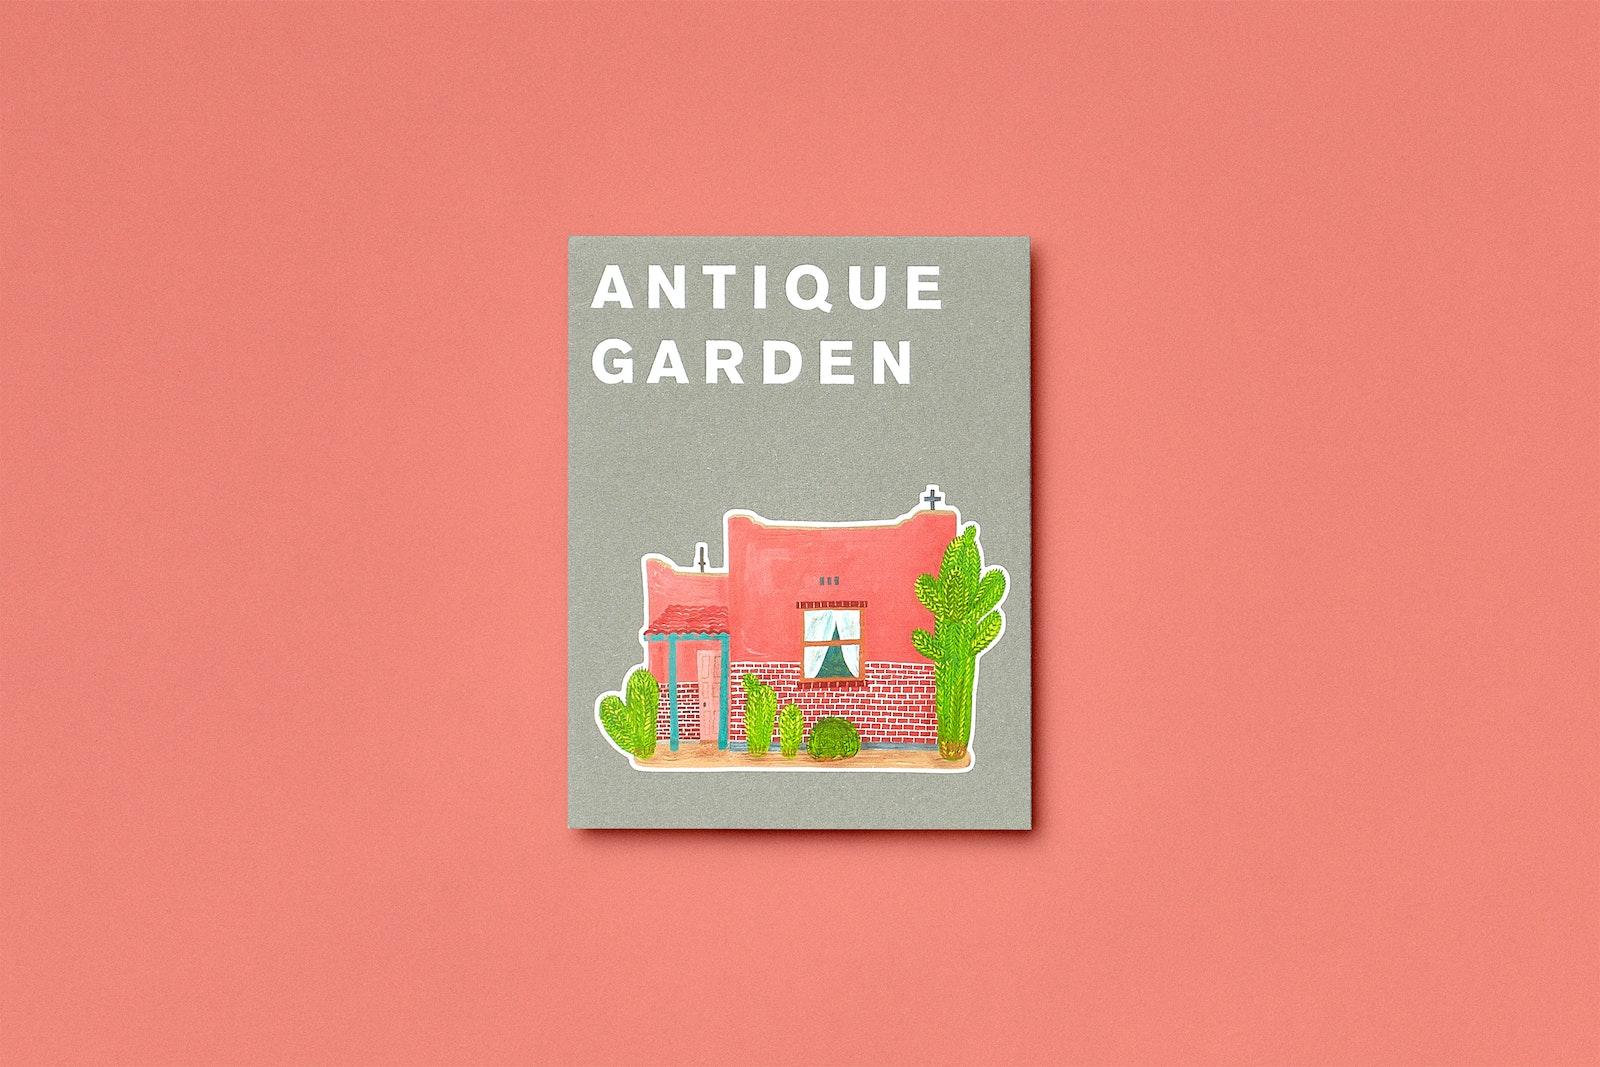 Antique Garden